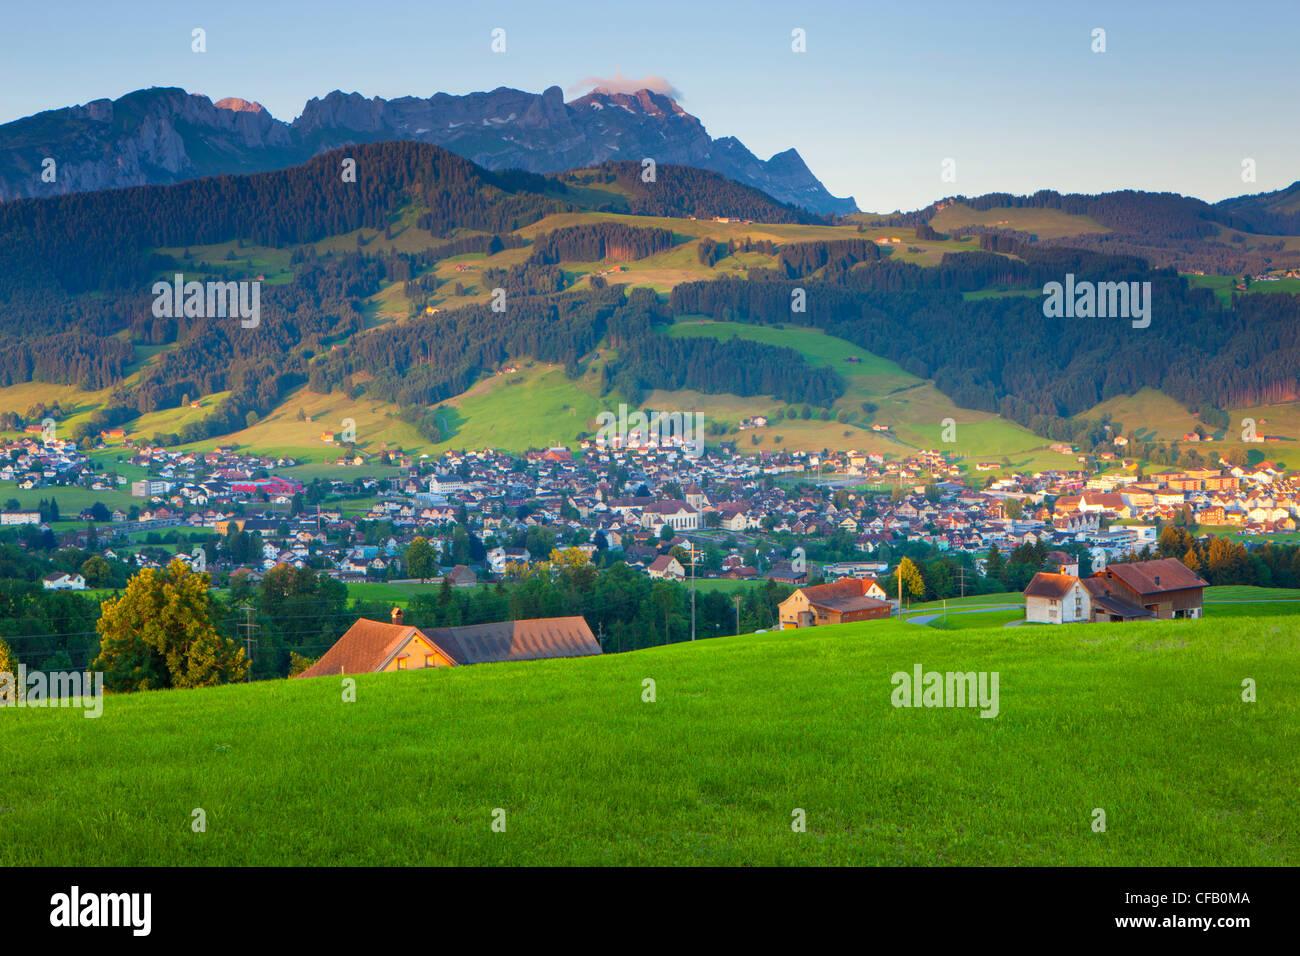 Appenzell Switzerland canton Appenzell Innerrhoden town city